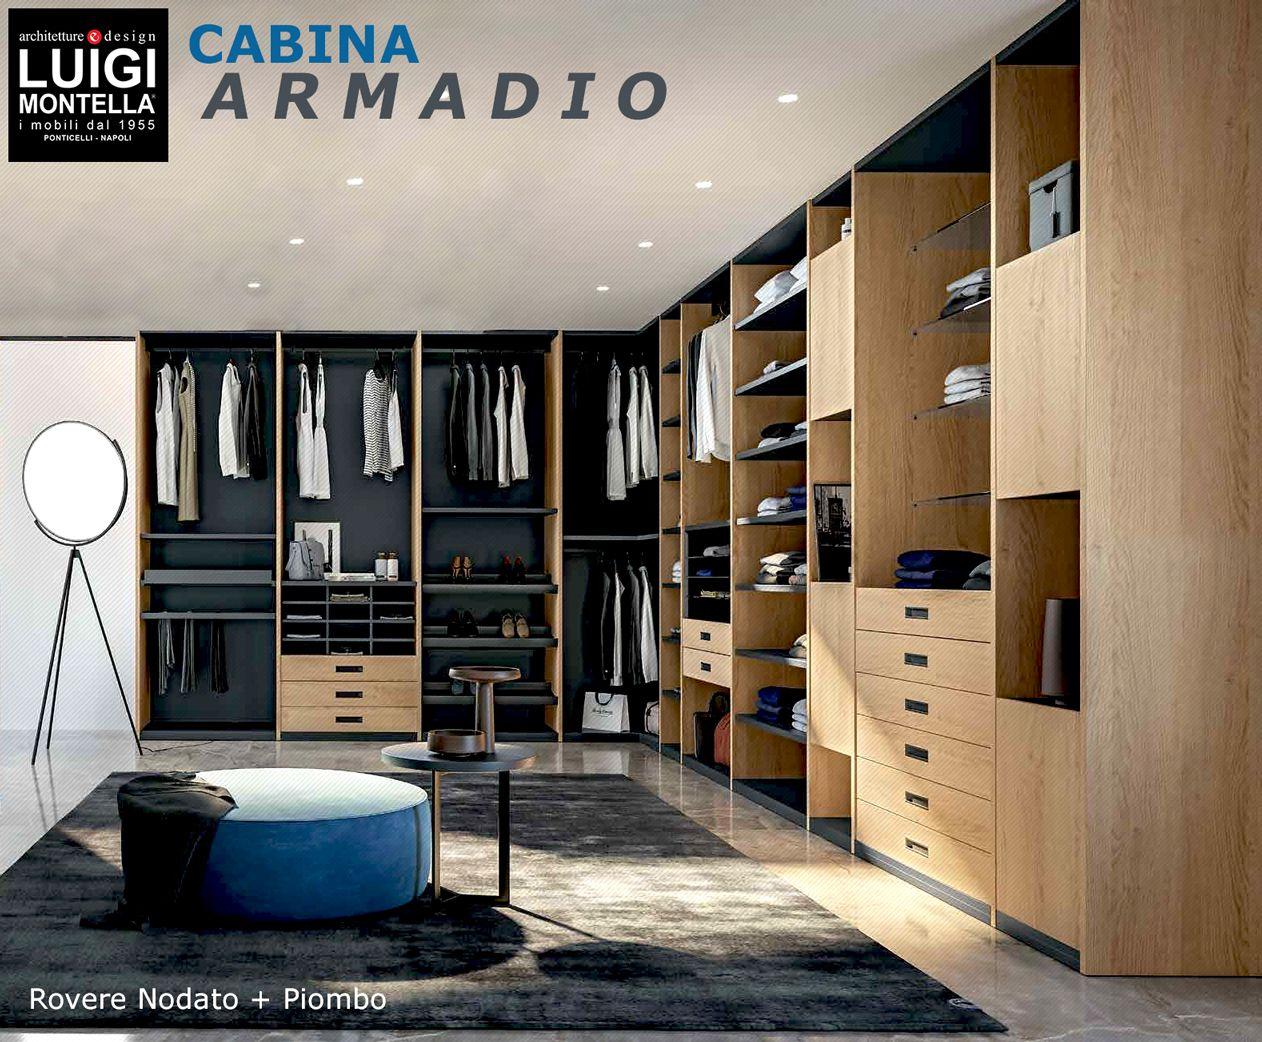 Cabina armadio nel 2020   Cabina armadio, Armadio, Arredamento